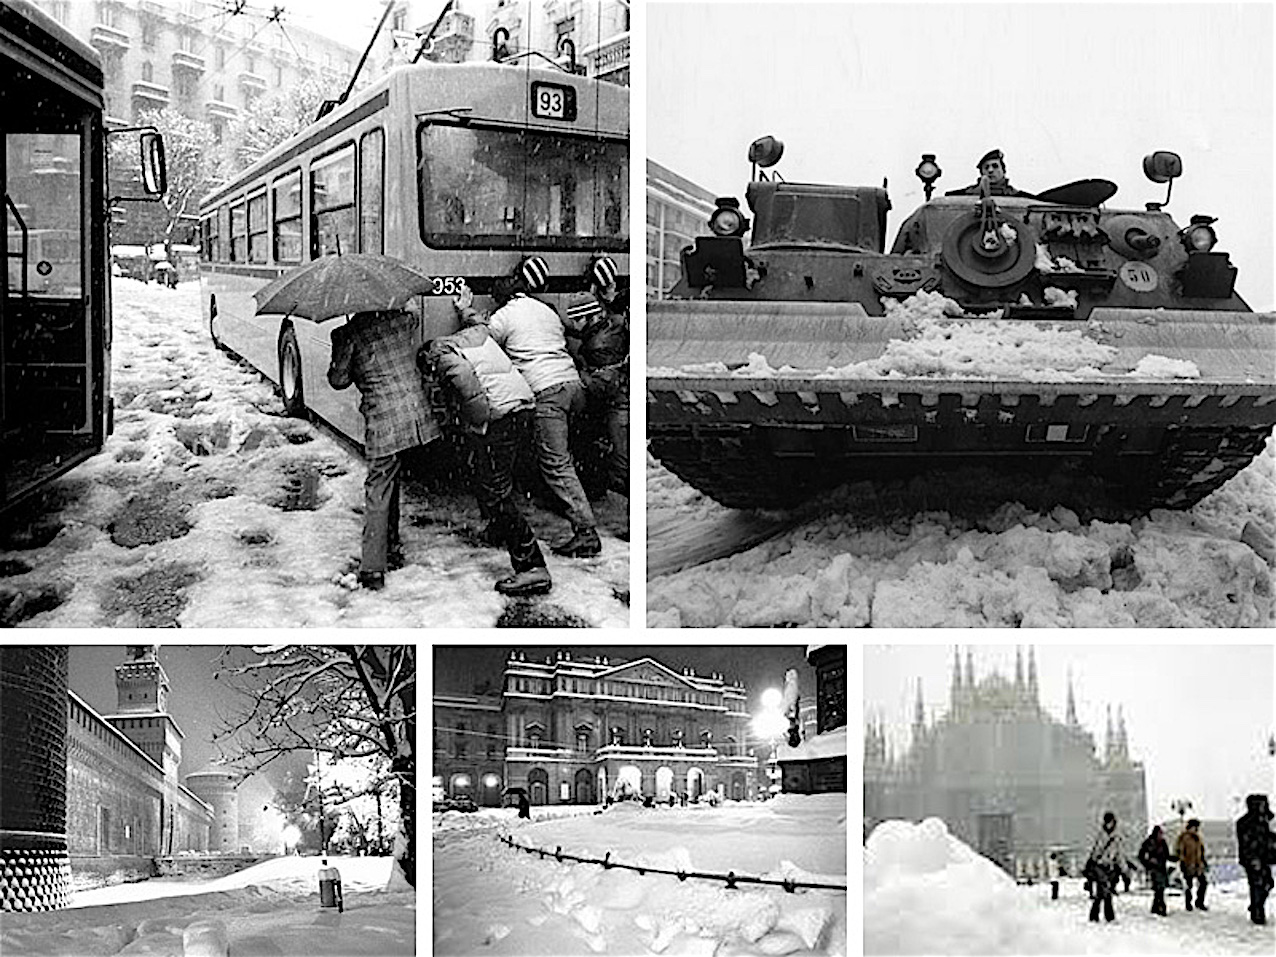 nevicata_1985_storia_foto